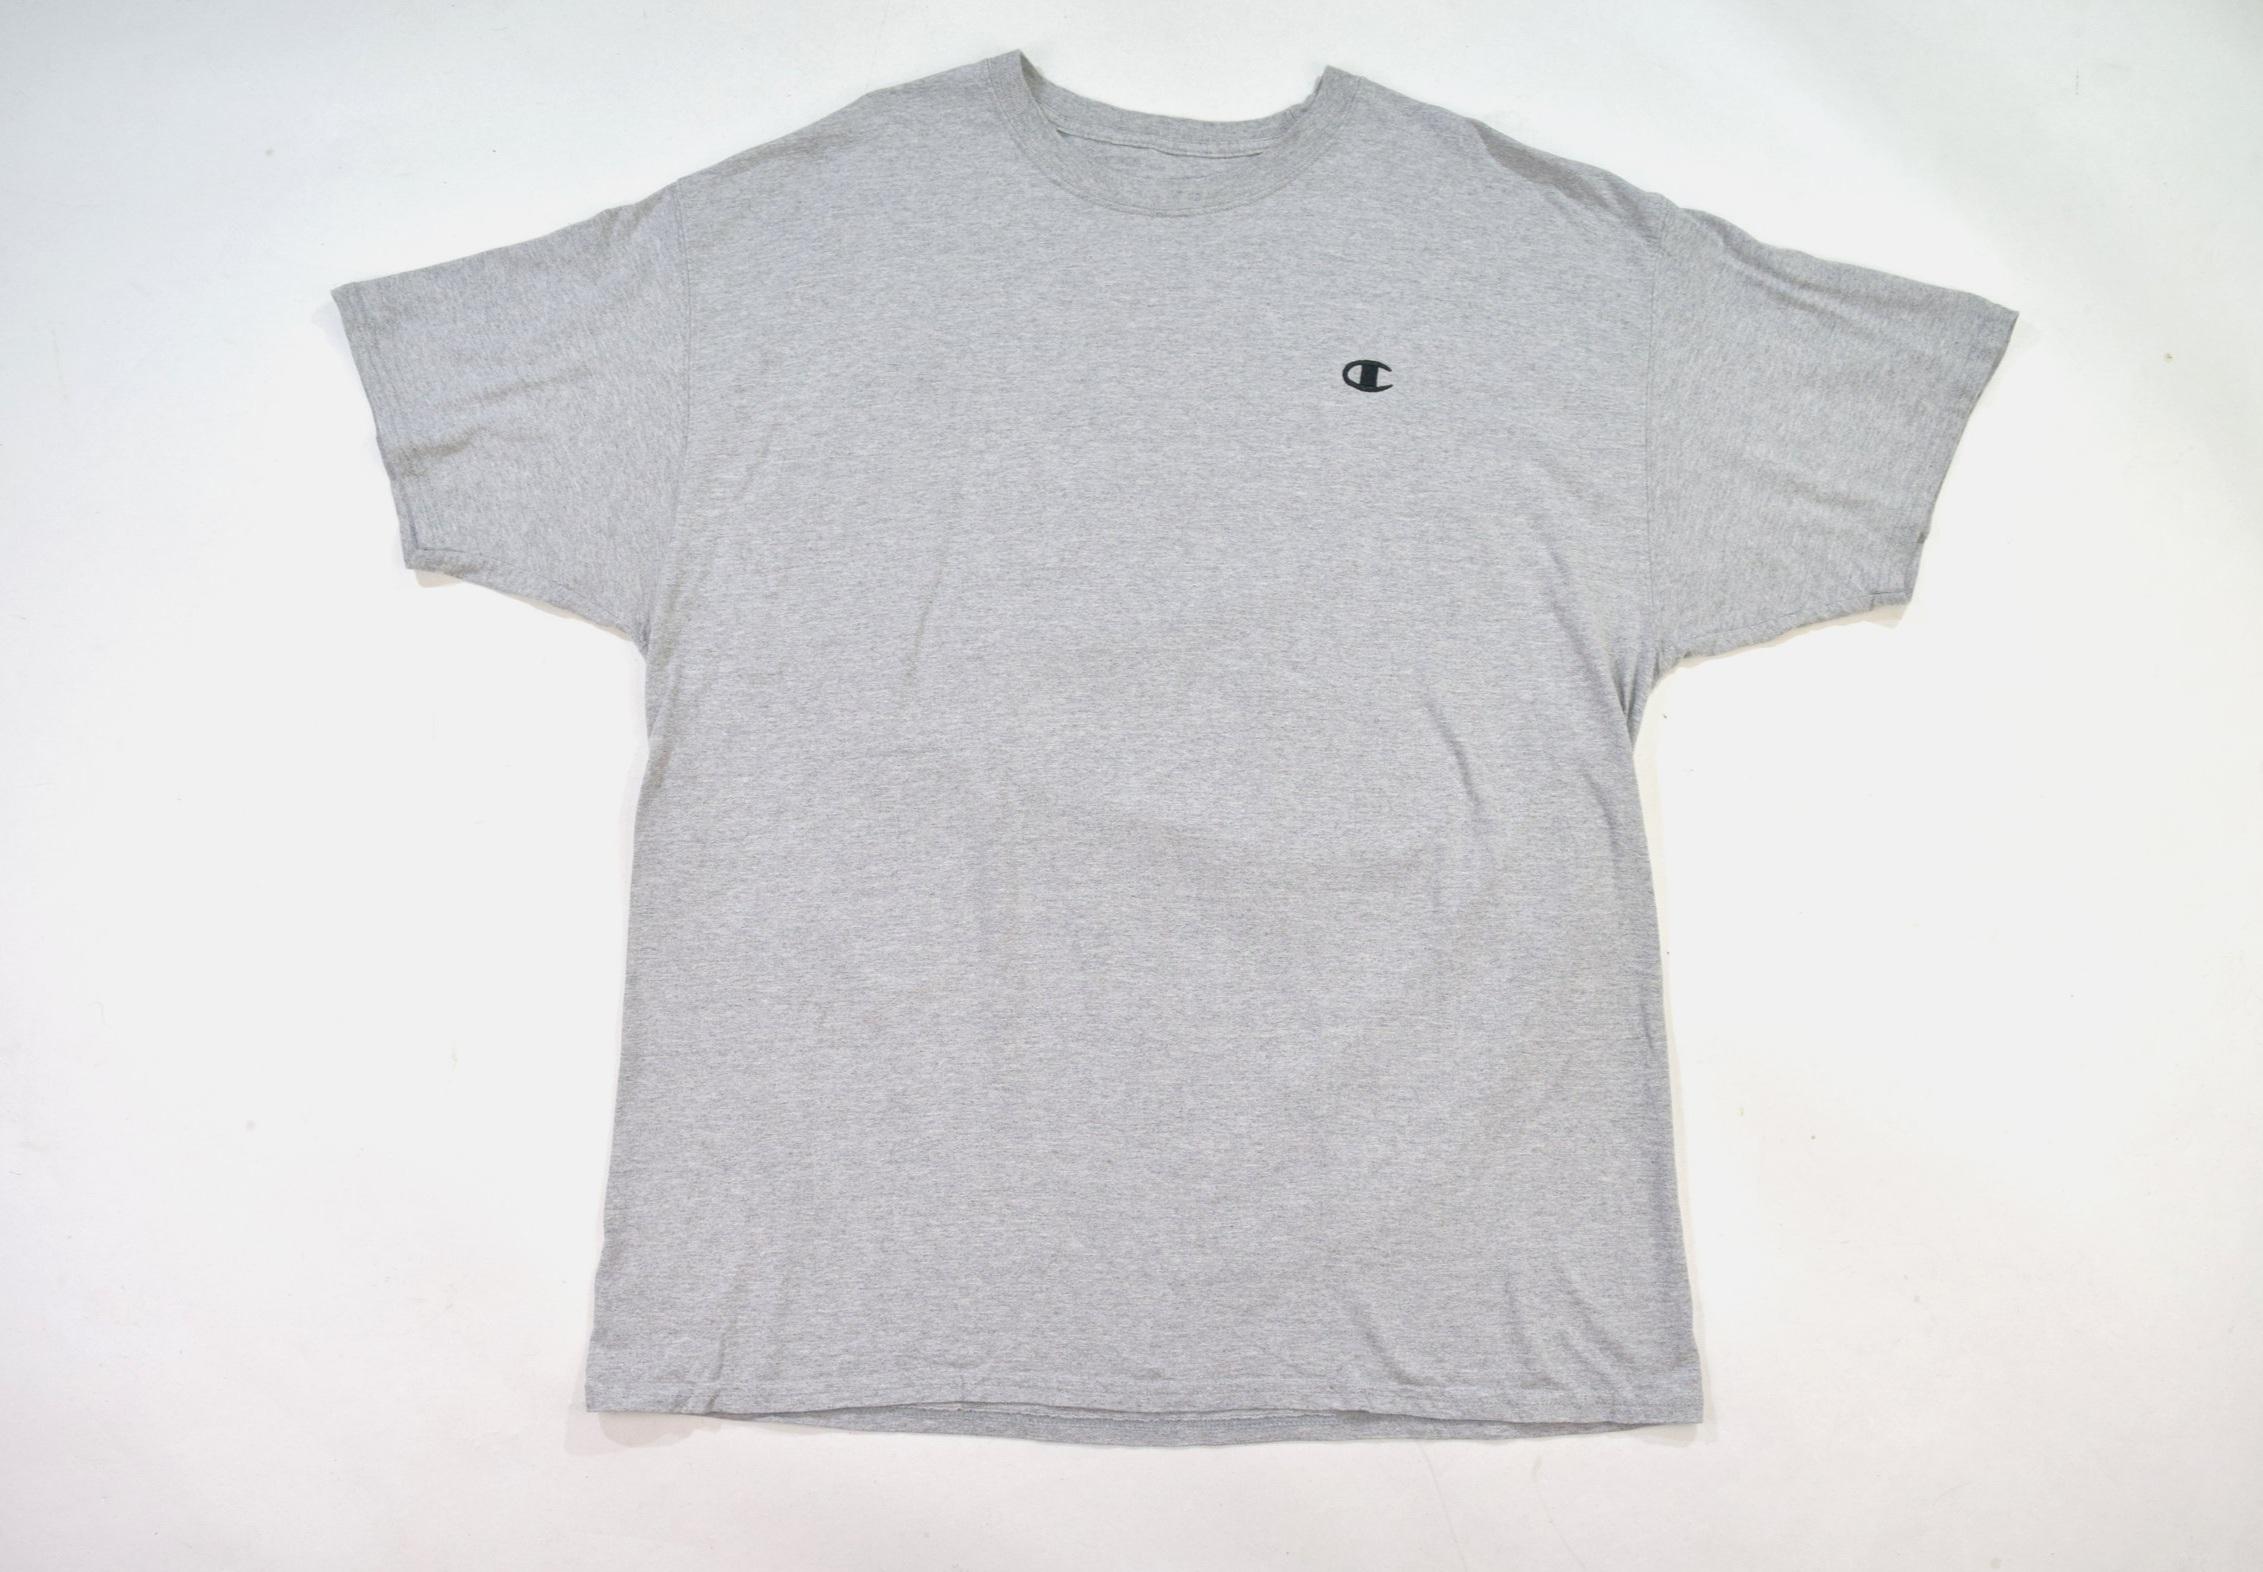 708dc6c5 Grey Champion Crew Neck T Shirt — Headlock Vintage